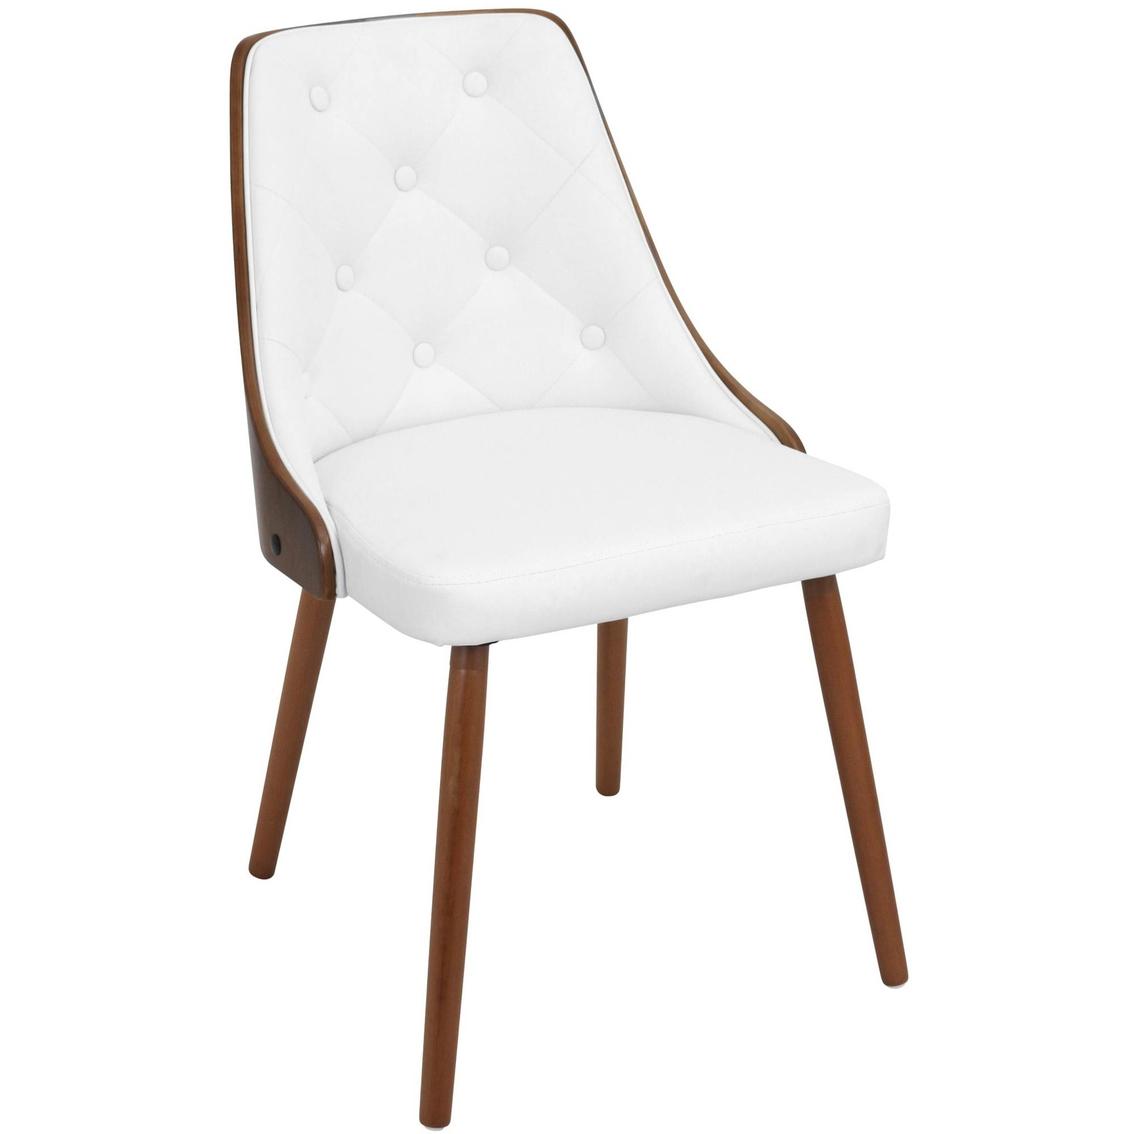 Groovy Lumisource Gianna Mid Century Modern Dining Accent Chair Cjindustries Chair Design For Home Cjindustriesco